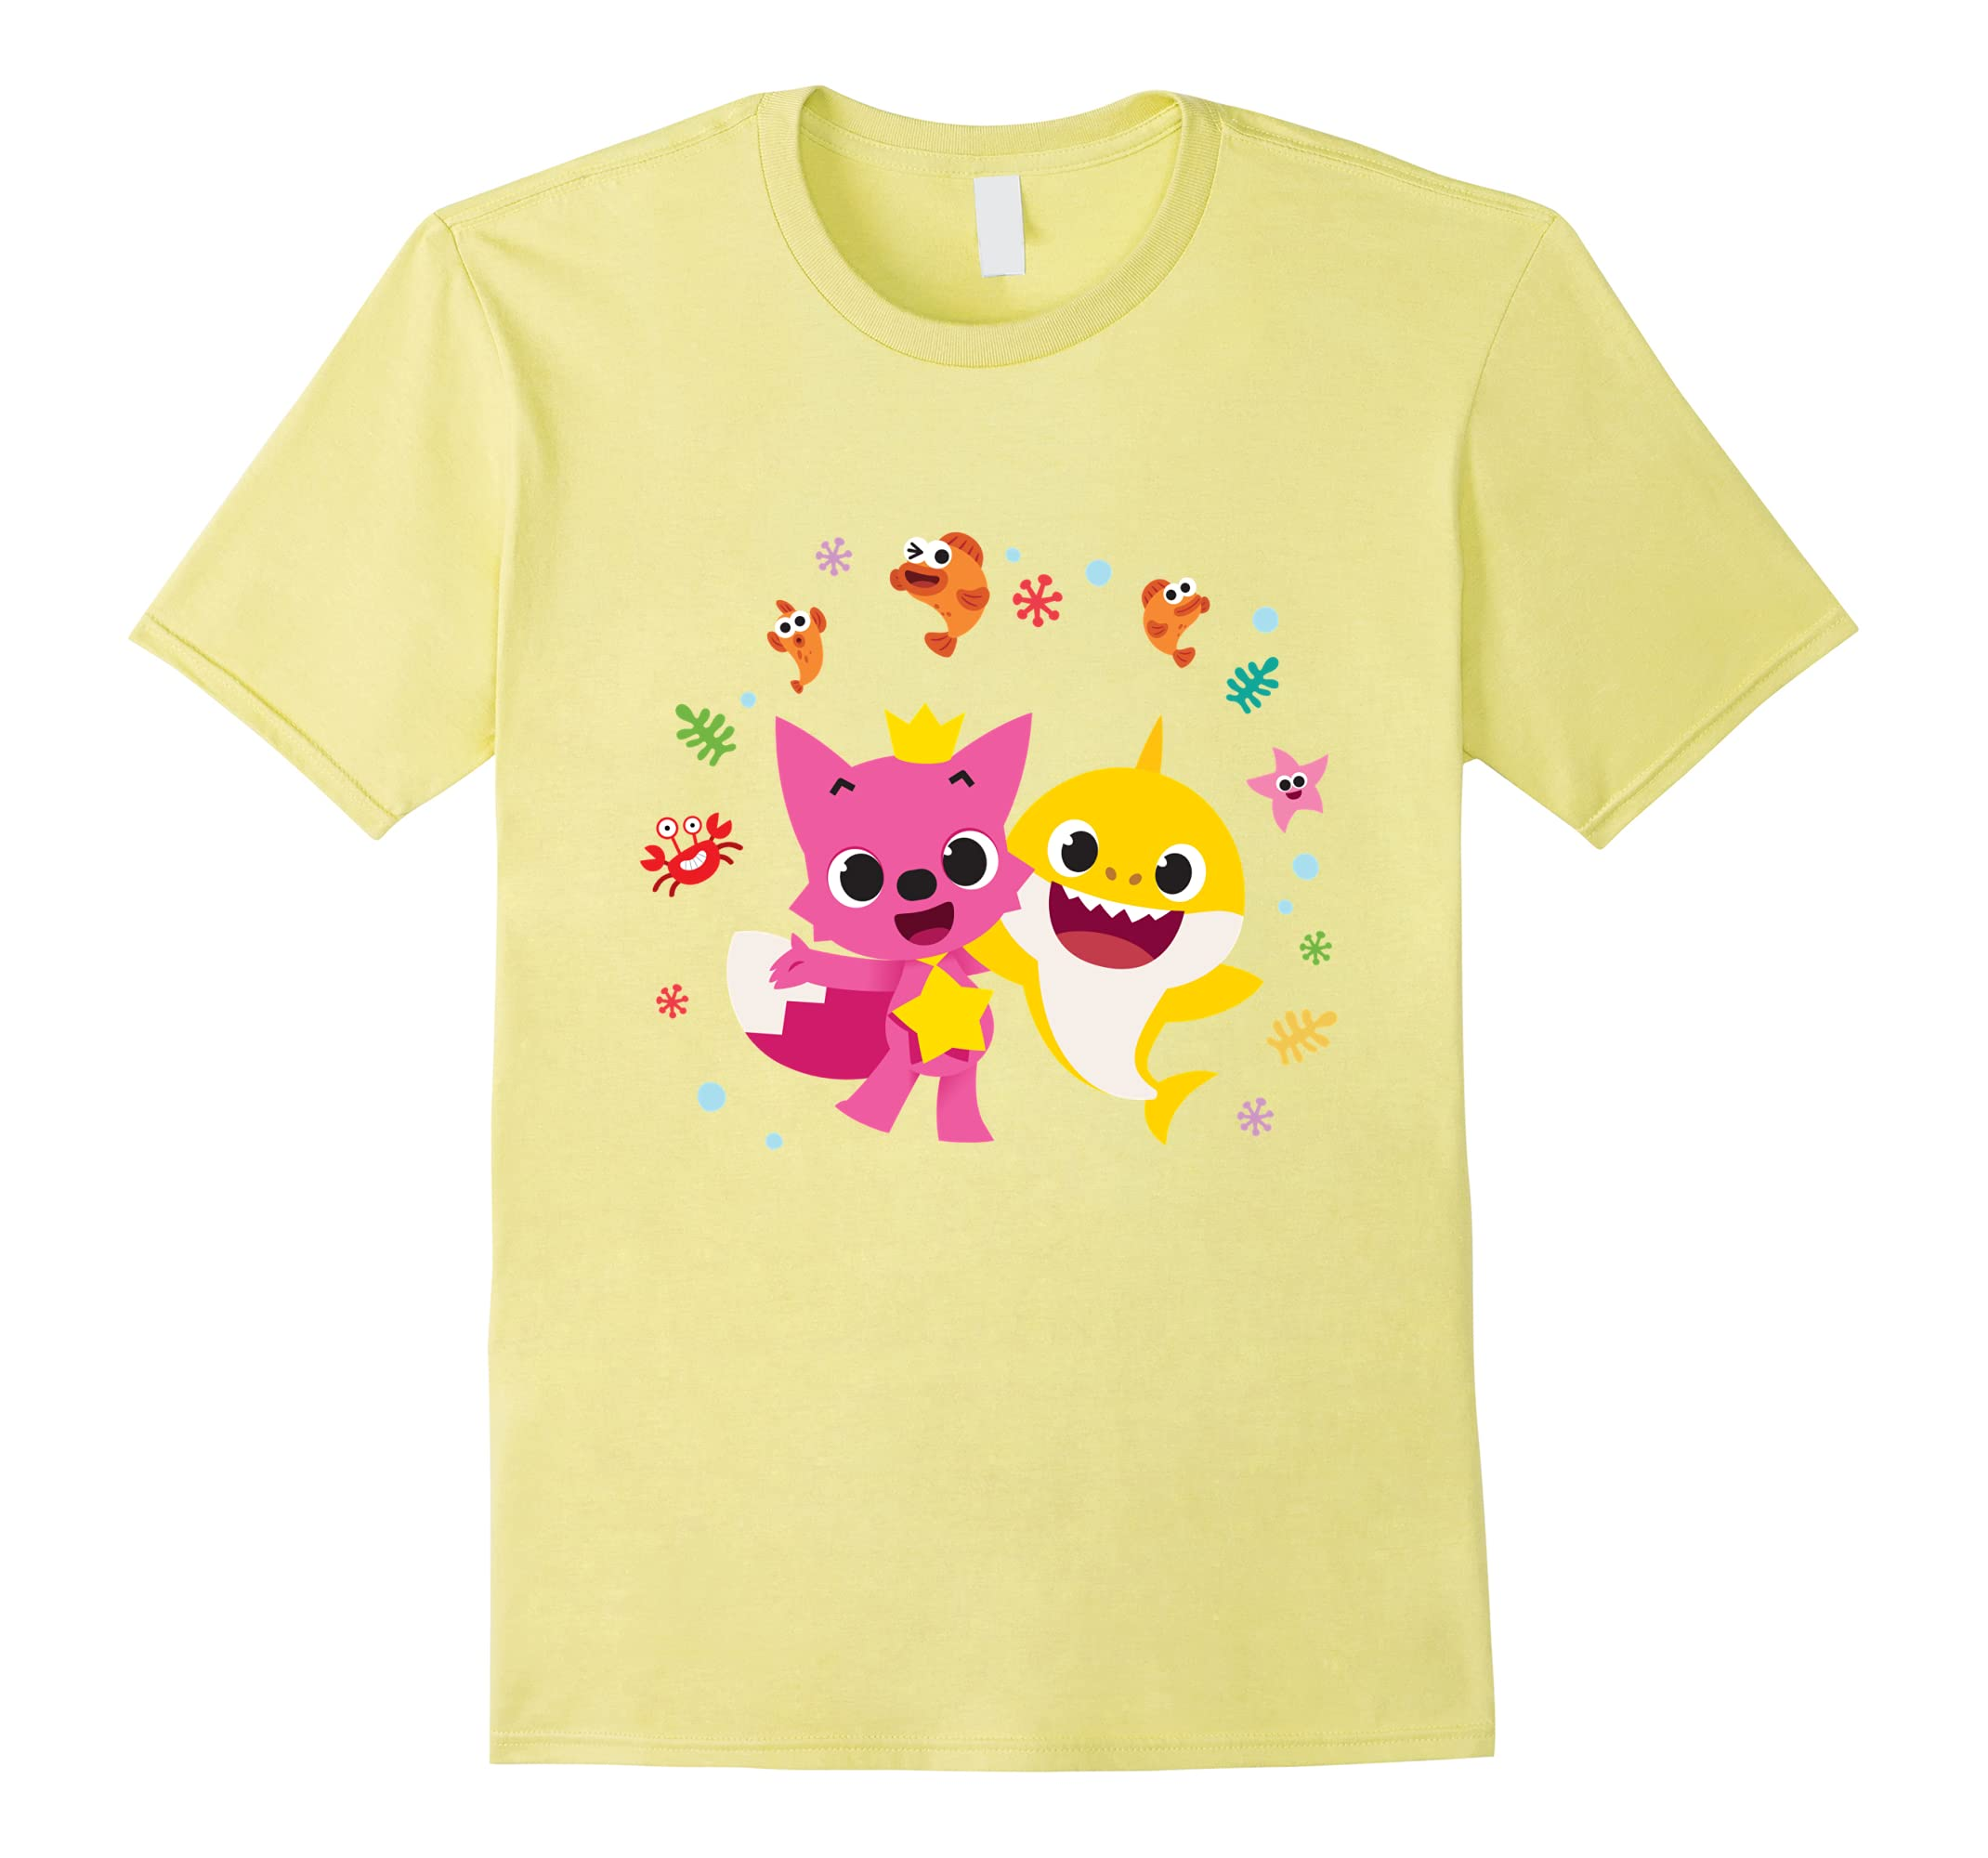 b4409b96b Pinkfong and Baby Shark T-shirt-RT – Rateeshirt